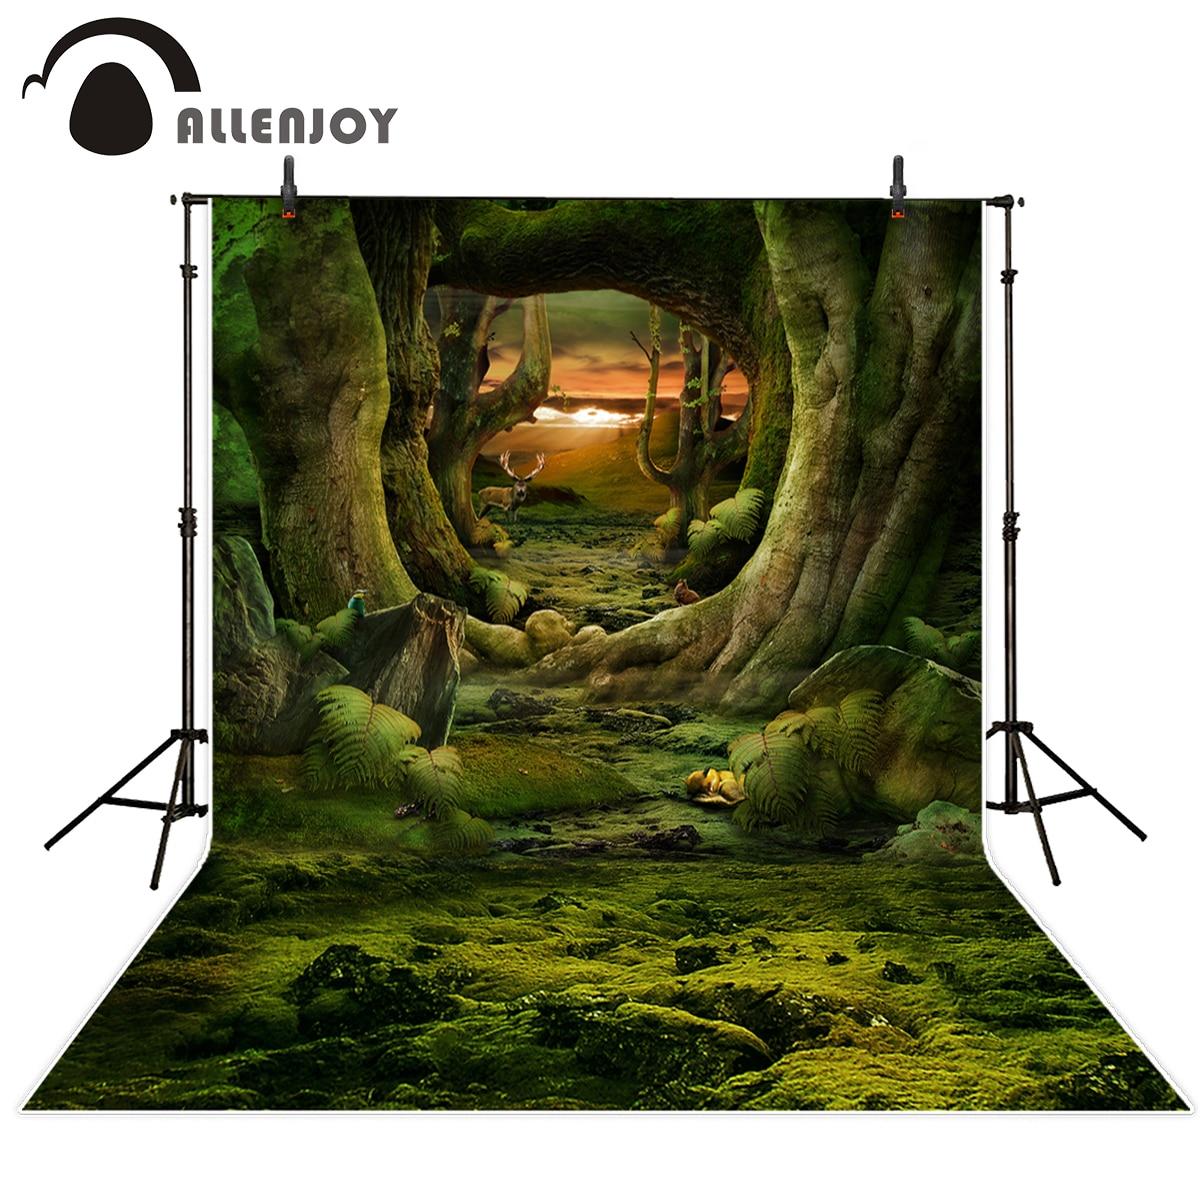 Allenjoy camera photography profissional Sunset Grassland Original forest Backgrounds for photo studio computer printed vinyl цена